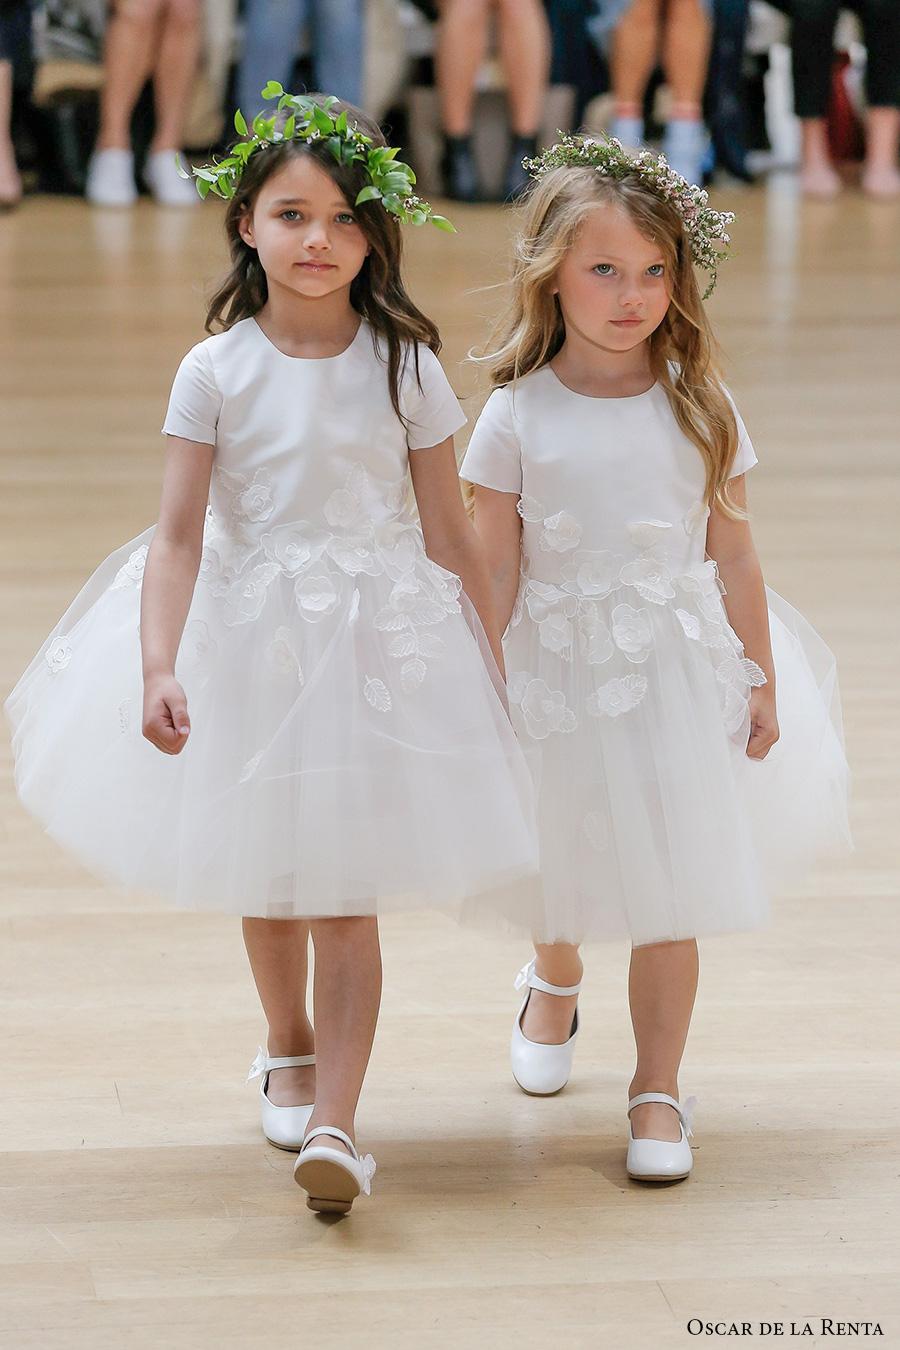 848972894b1 oscar de la renta spring 2018 bridal pretty flower girl dress (104) mv